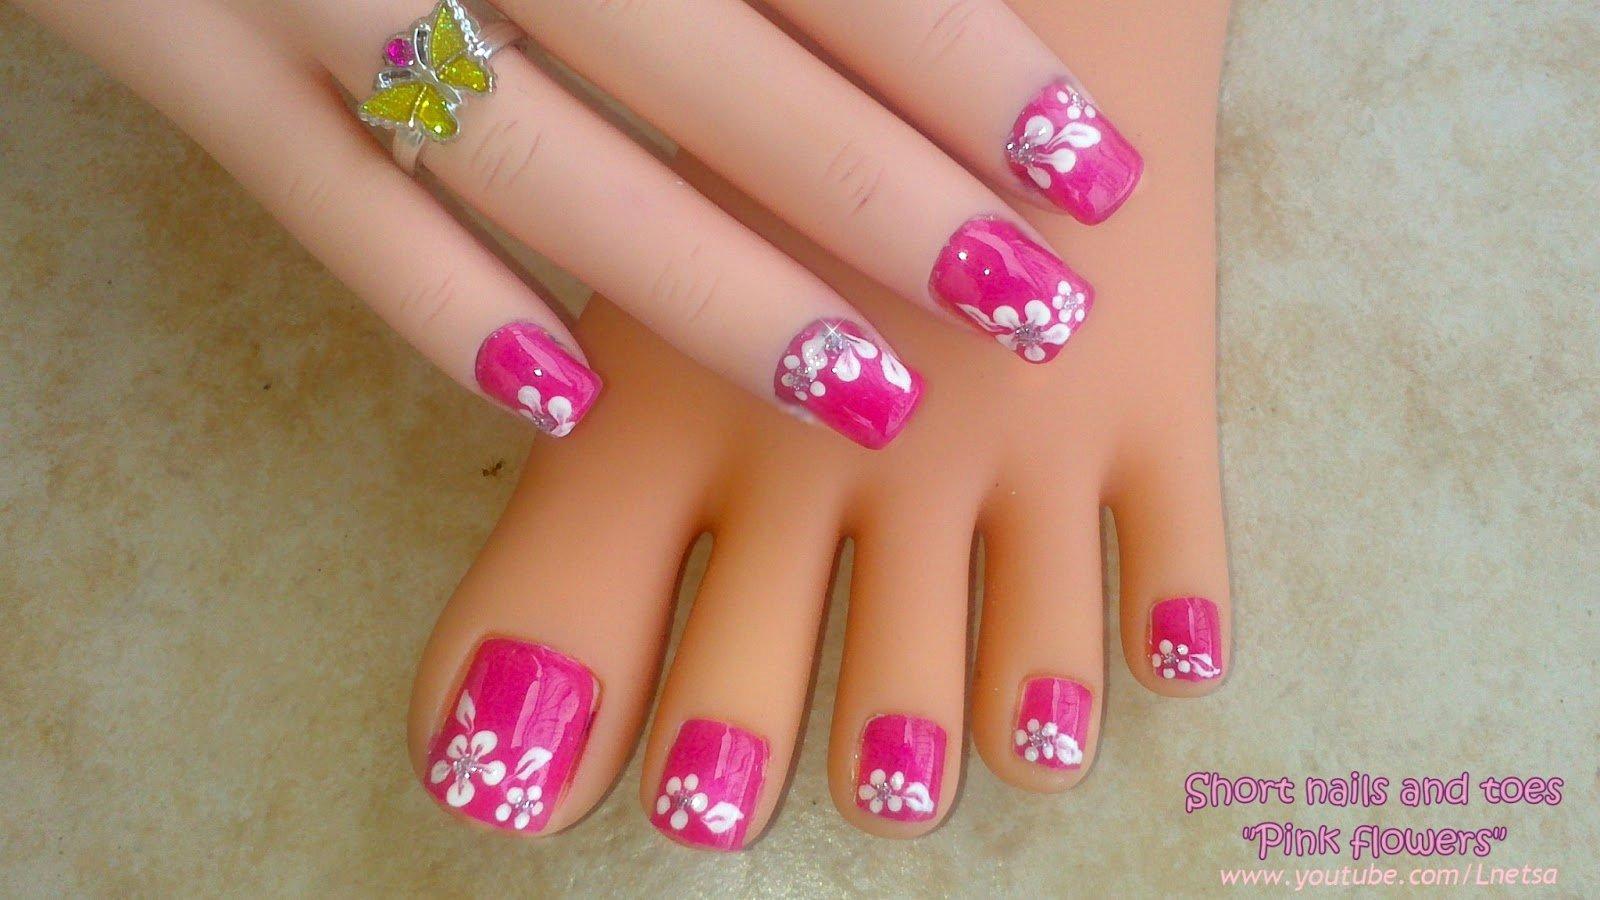 Toe Nail Design Pictures Lovely Lnetsa S Nailart toe Nail Design Short Nails Version